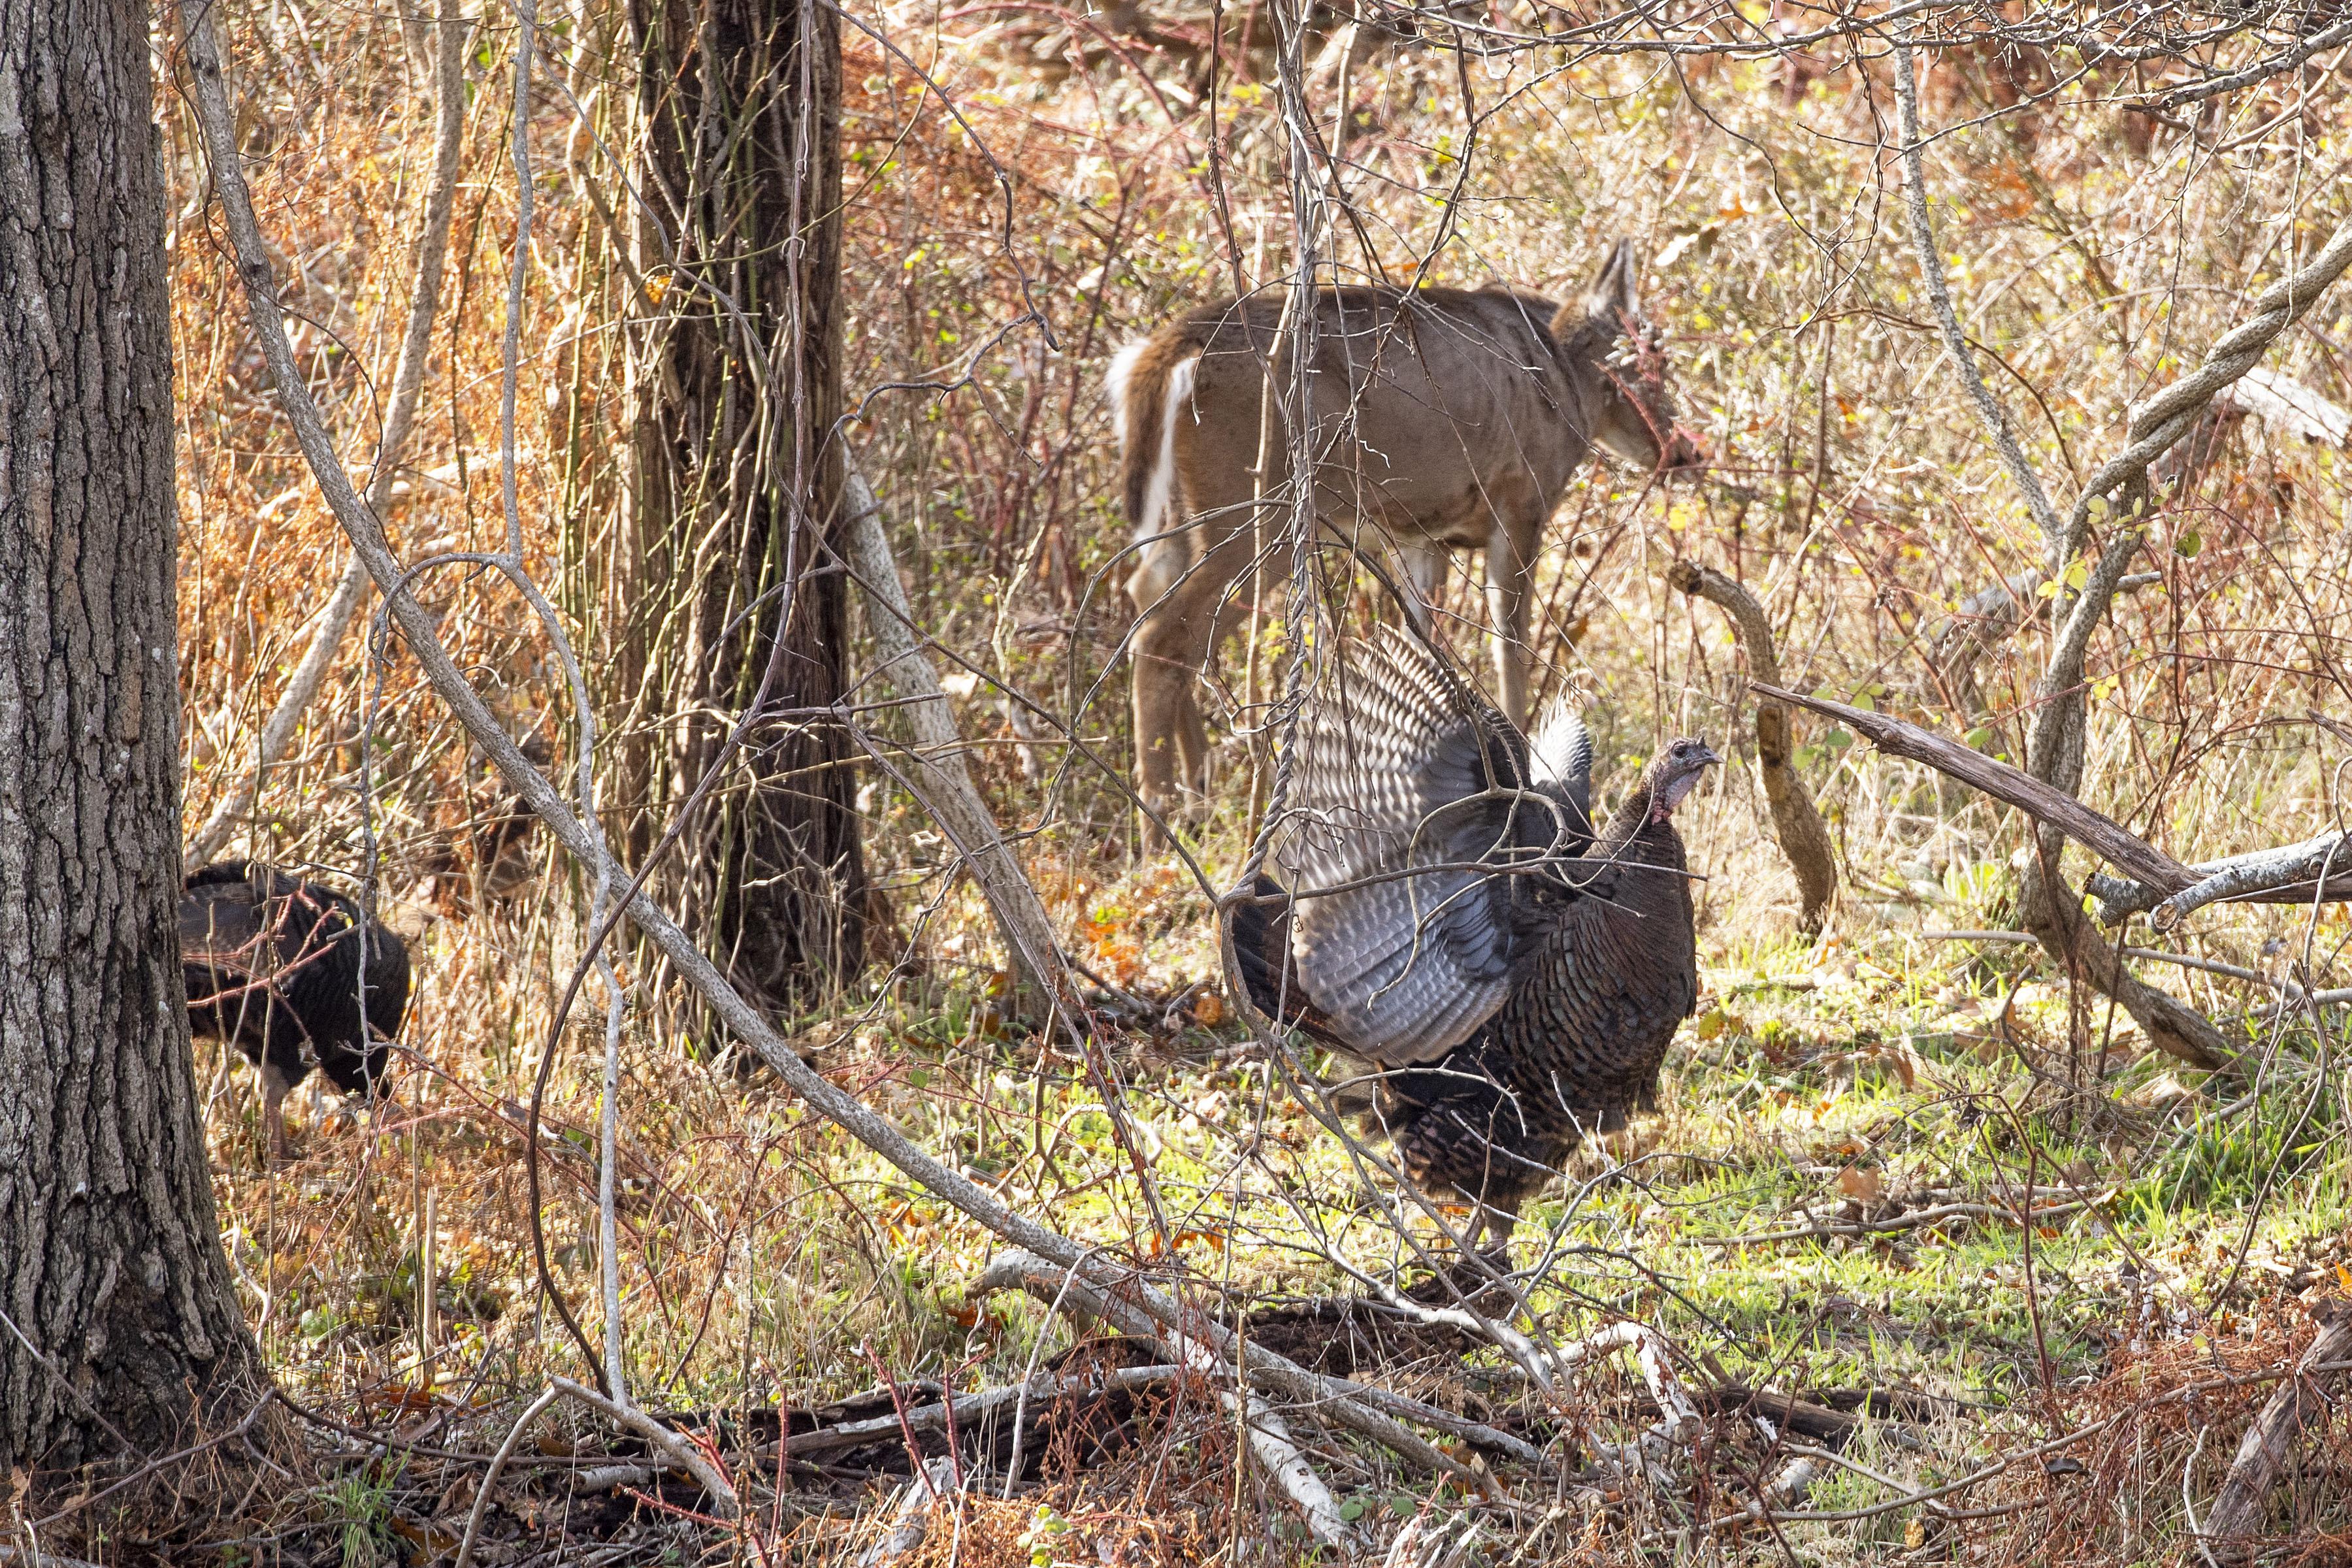 Wild turkeys feed alongside a deer at the Morton Wildlife Refuge on Monday MICHAEL HELLER